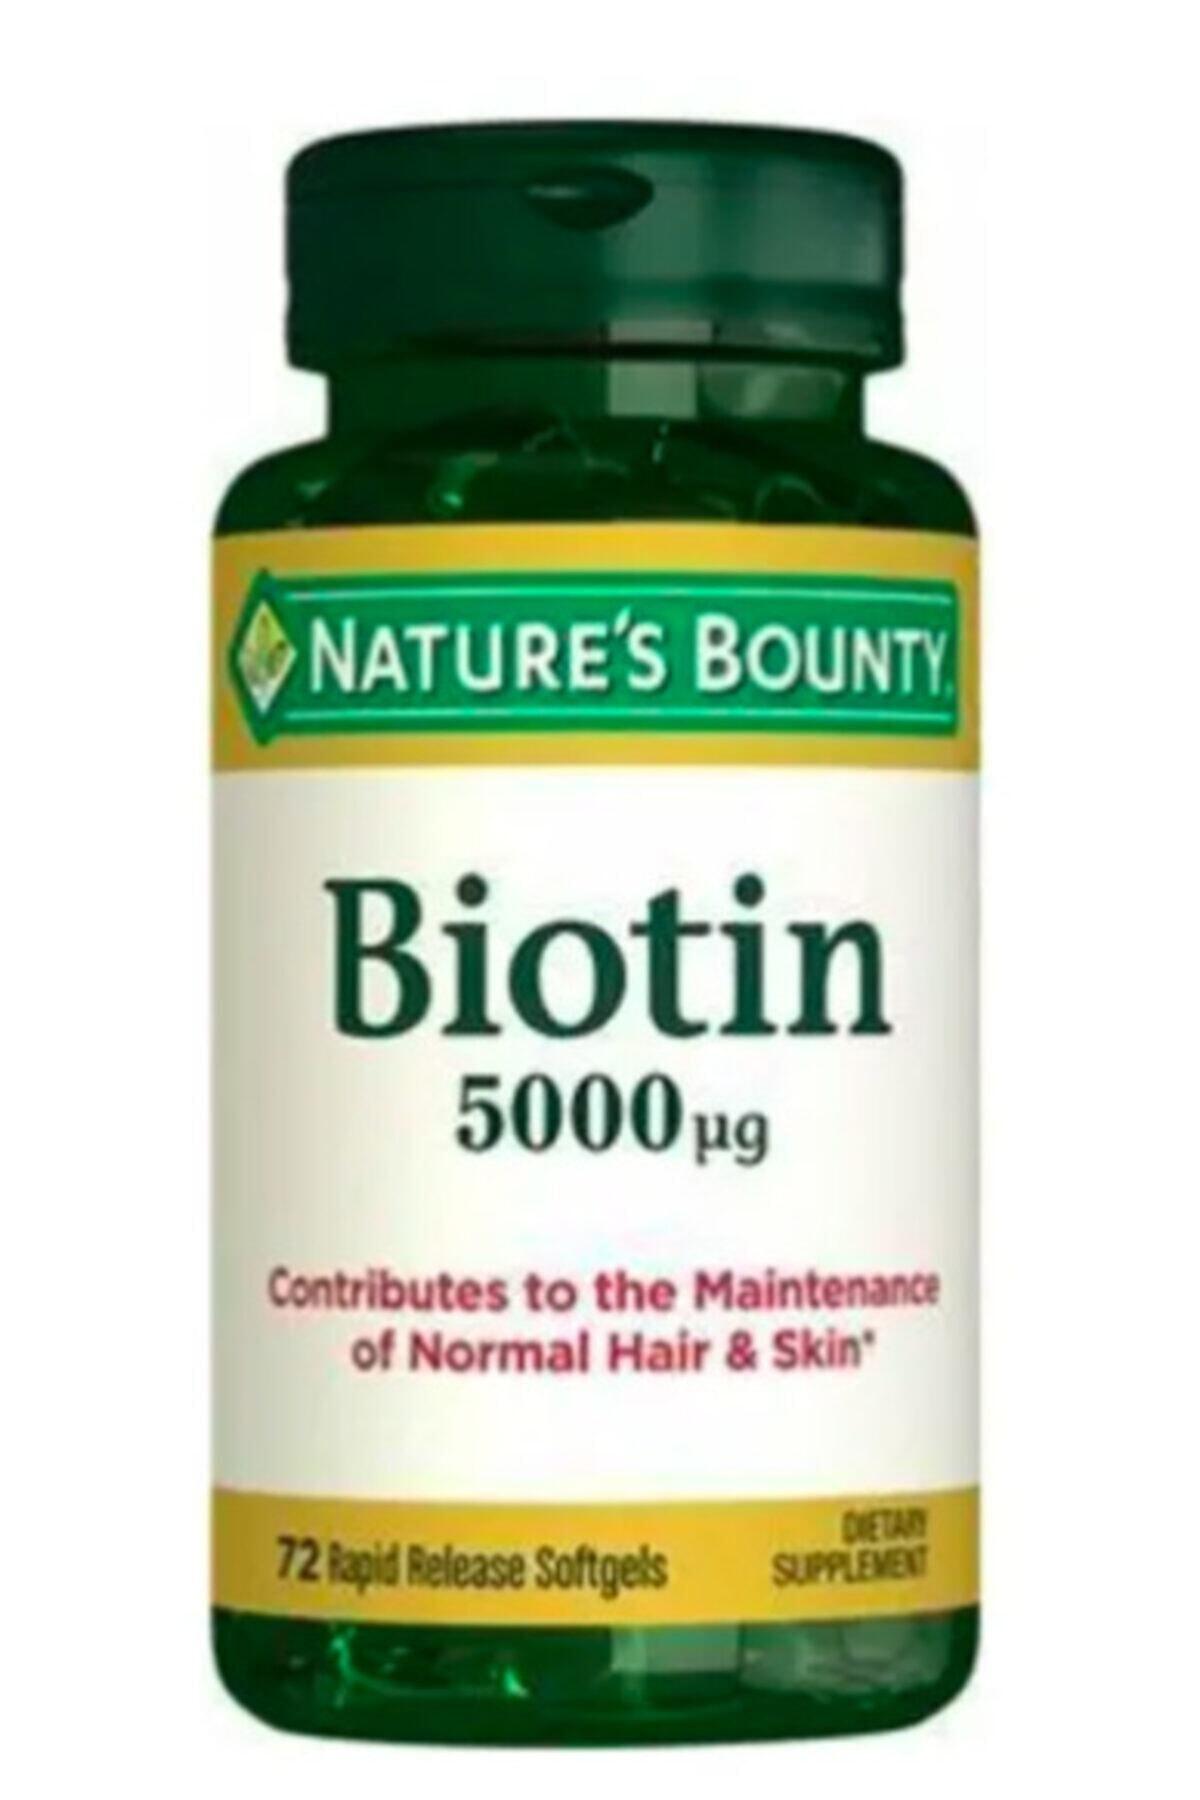 Nature's Bounty Biotin 5000 Mcg 72 Kapsül 1